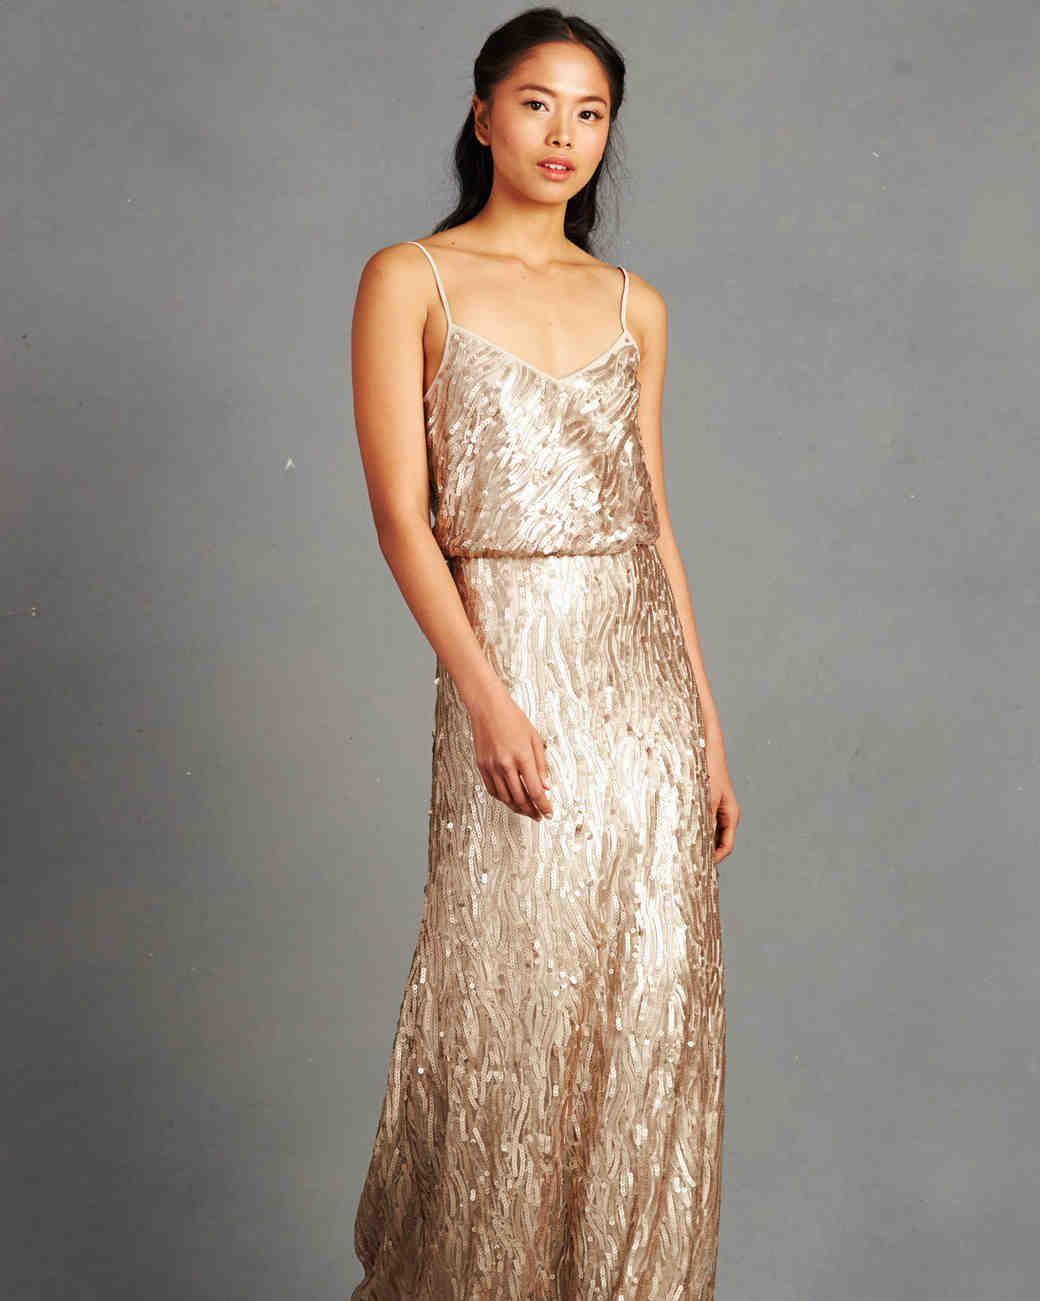 Wedding dresses with gold  bridesmaid dress  WEDDINGS  Pinterest  Dresses Gold